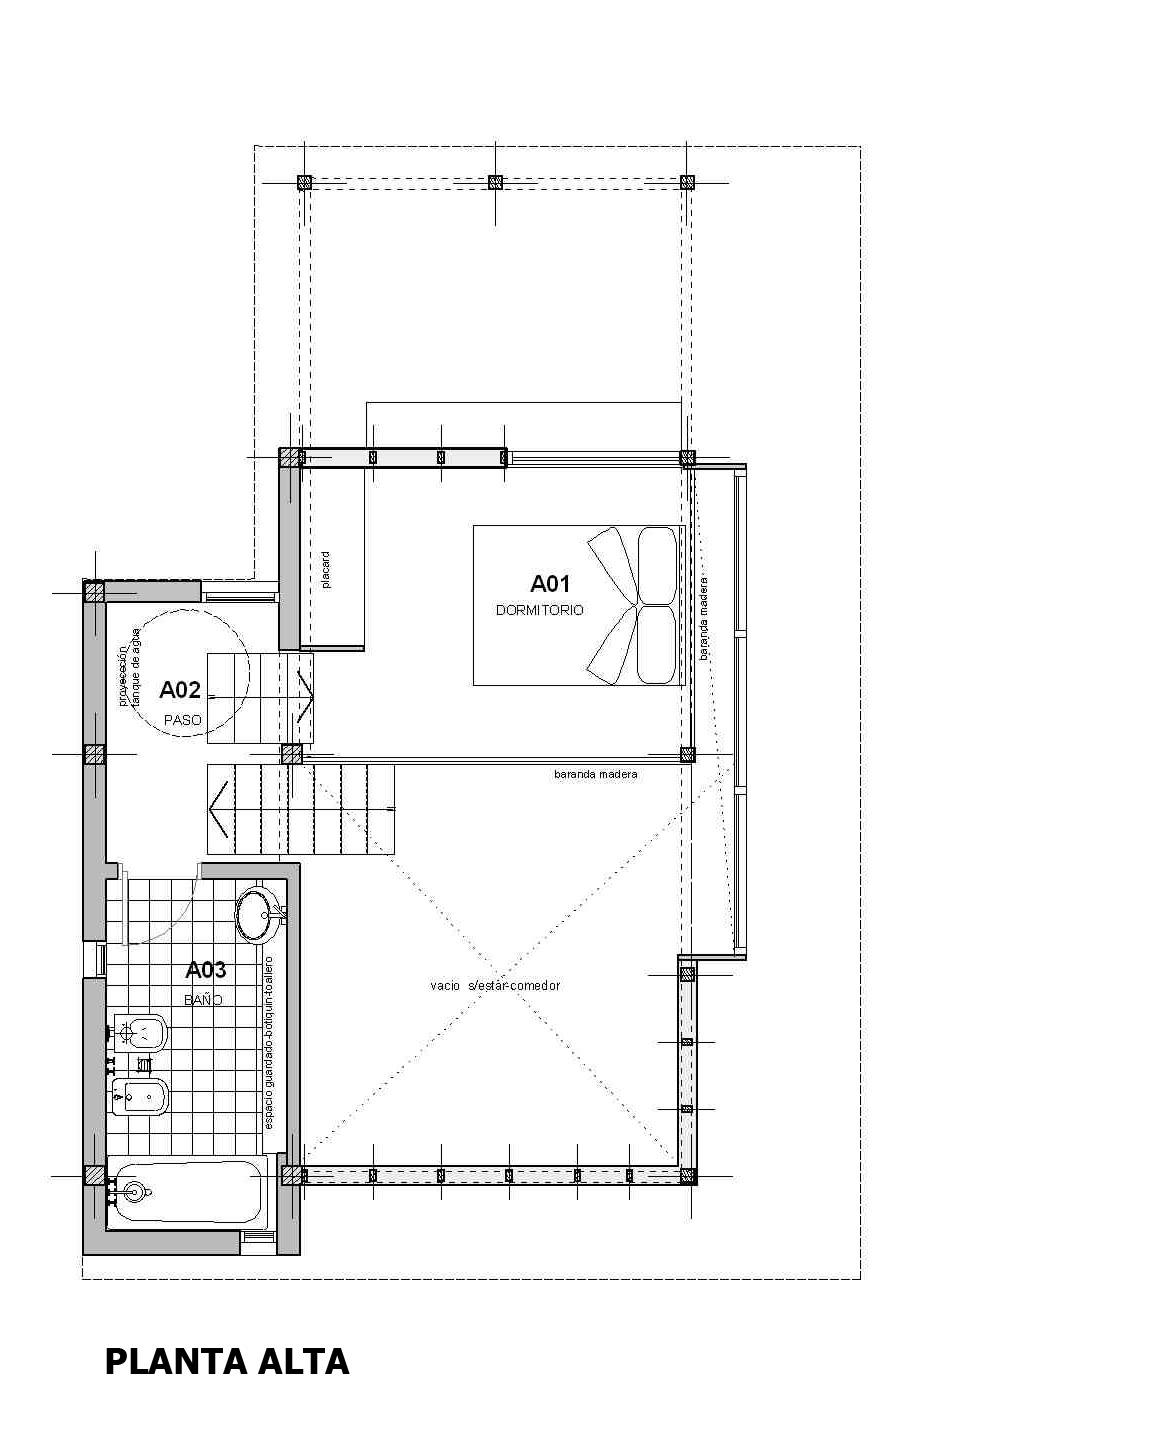 Christian almeida arquitecto 1 05 10 1 06 10 for Kasa diseno interior